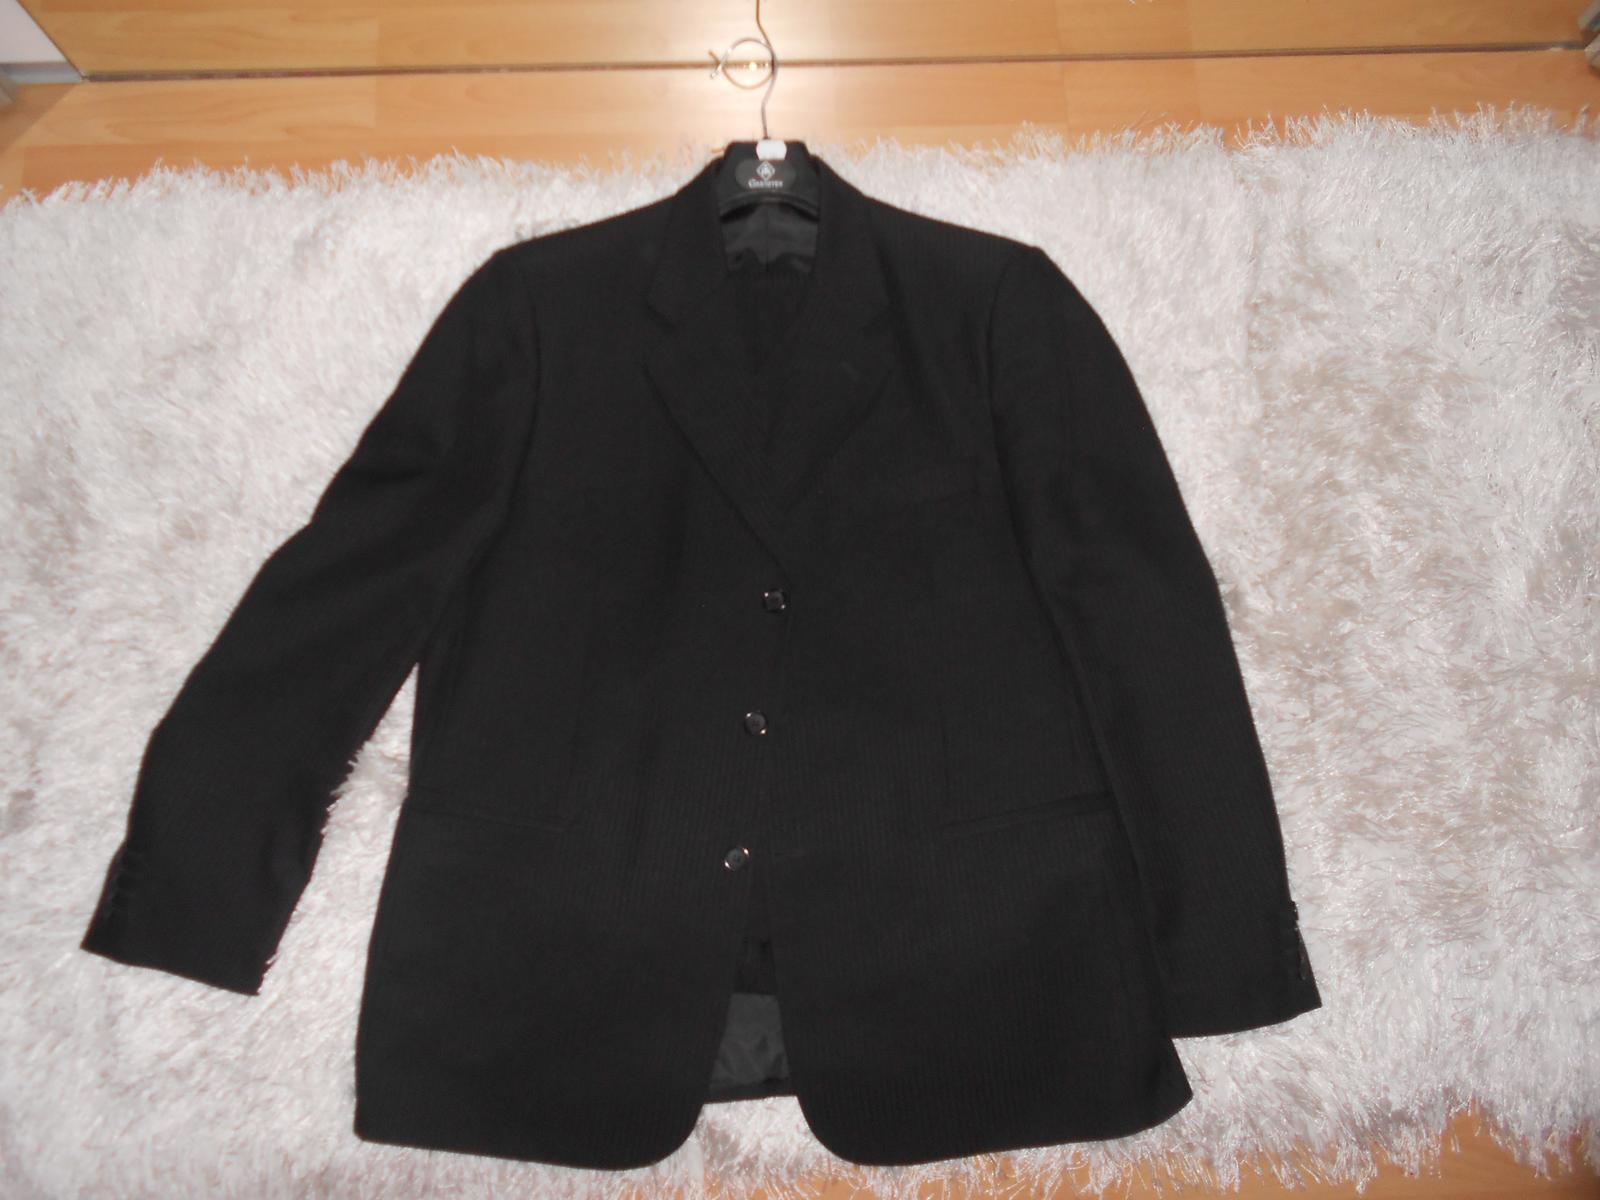 Oblek čierny + 2ks košele a kravaty gratis - Obrázok č. 2